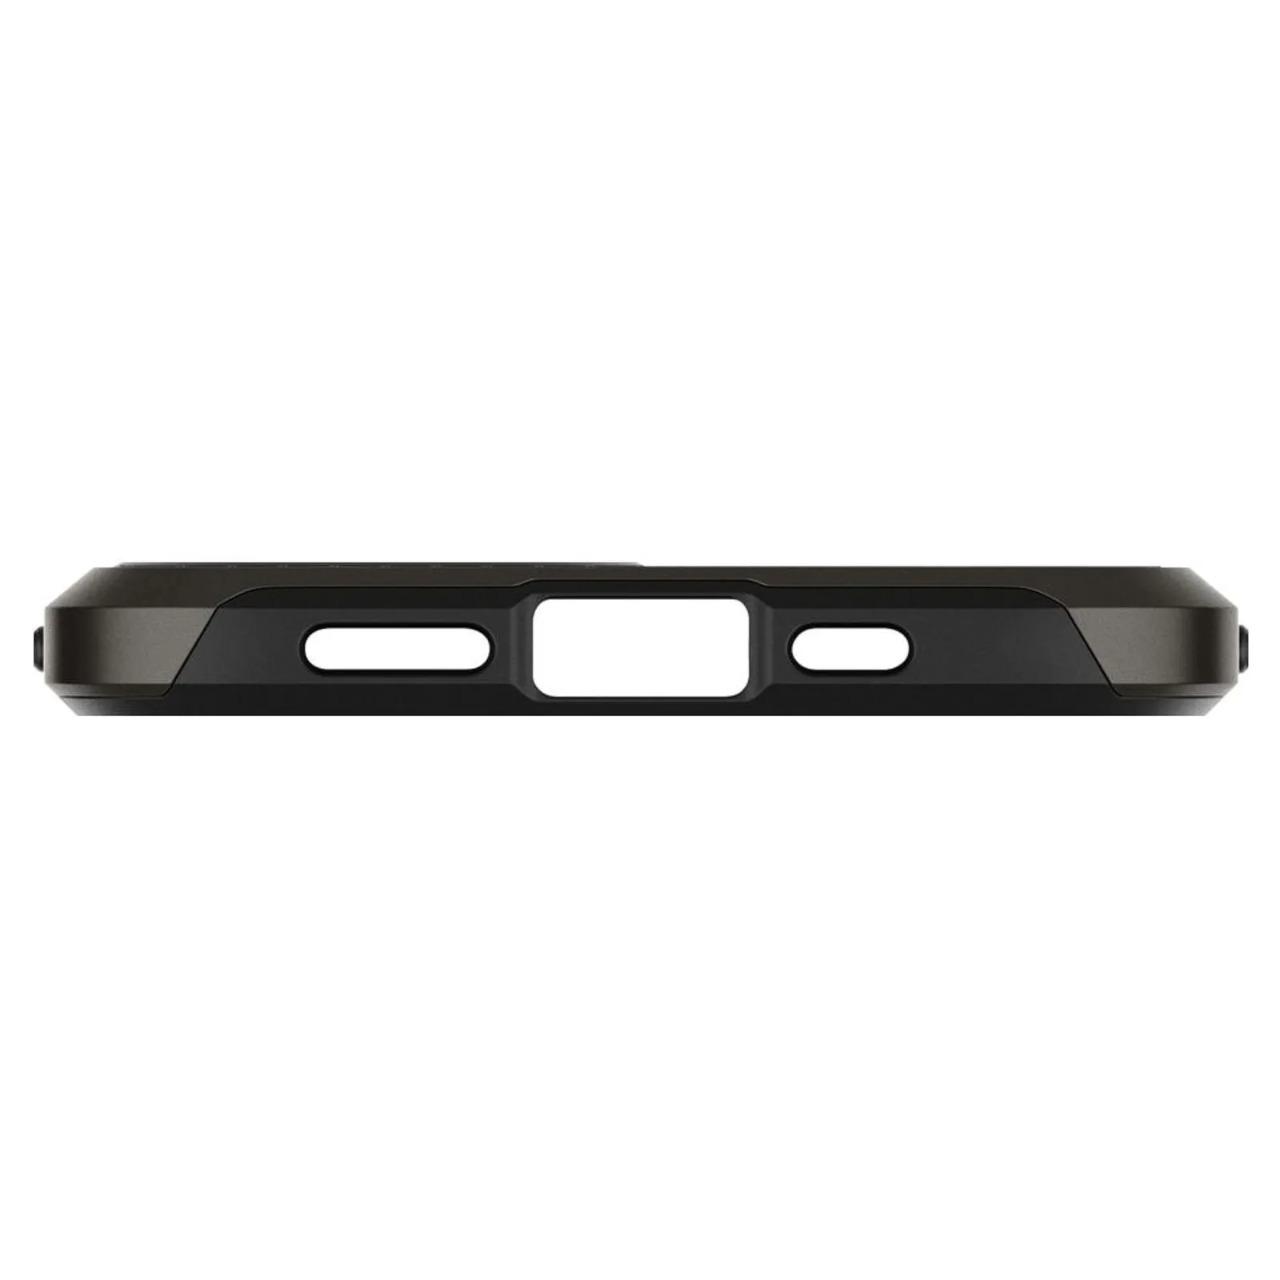 Capa Neo Hybrid Gunmetal Compatível com iPhone 12/12 Pro